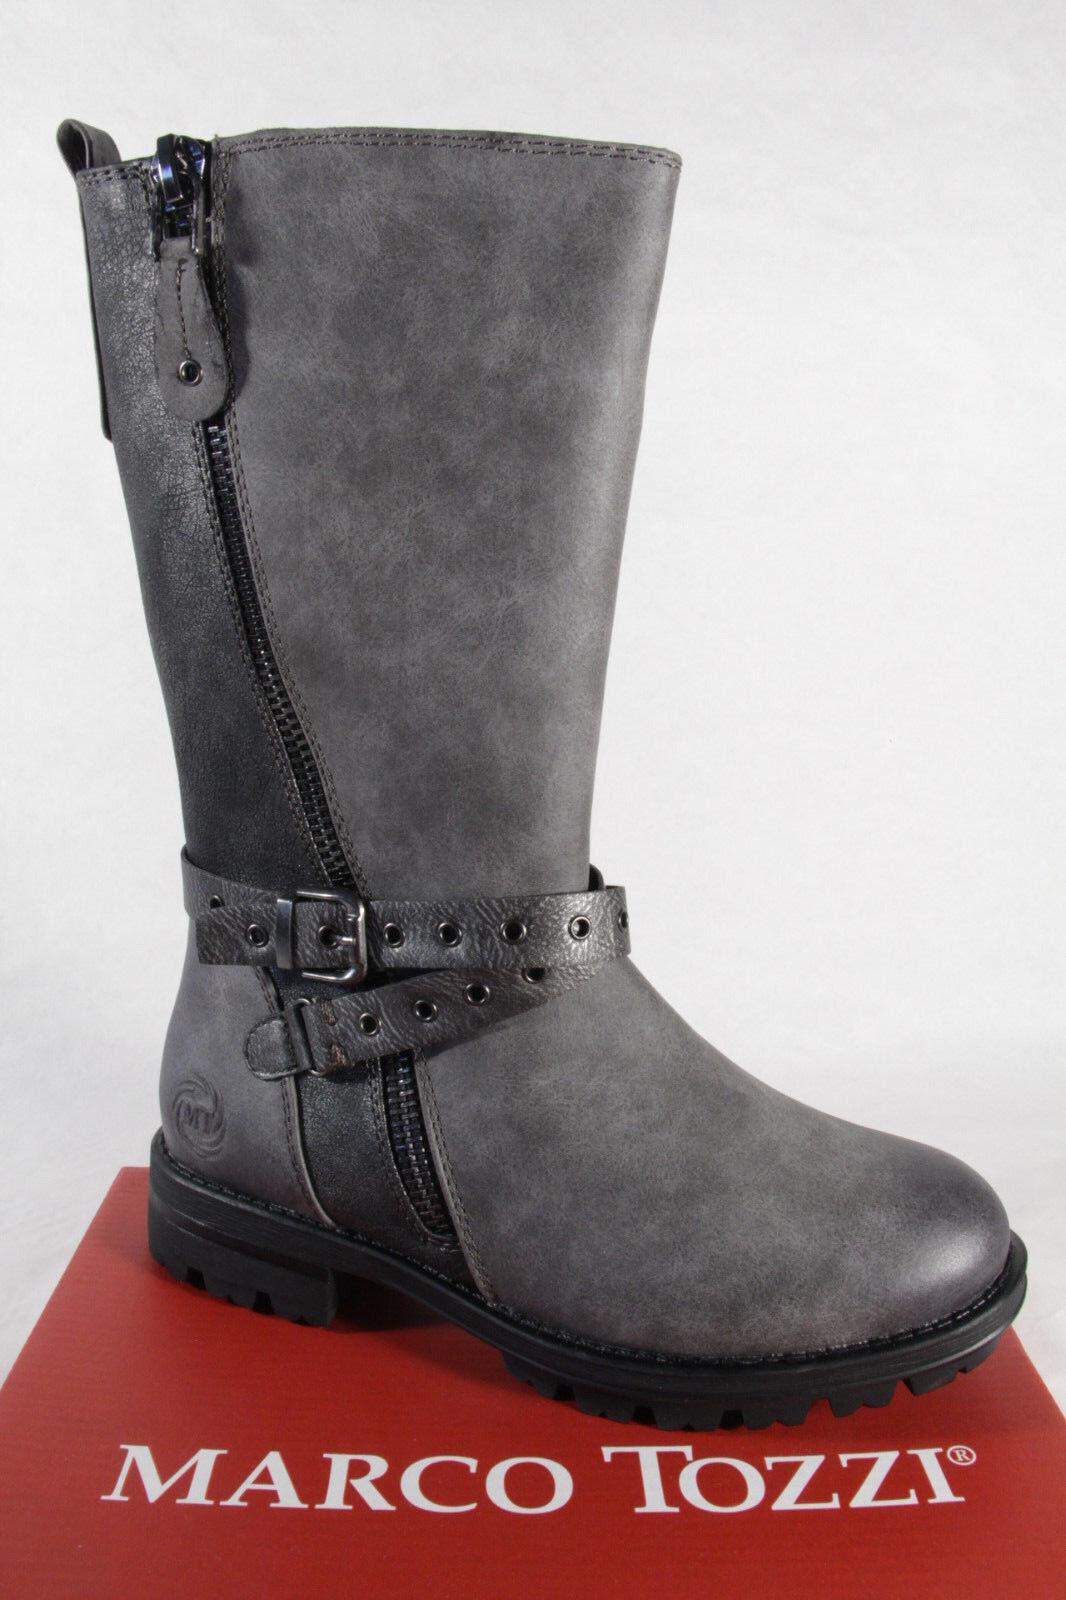 Marco Tozzi 46605 Stiefel, RV Stiefelette, Boots, grau, gefüttert, RV Stiefel, NEU! 481230